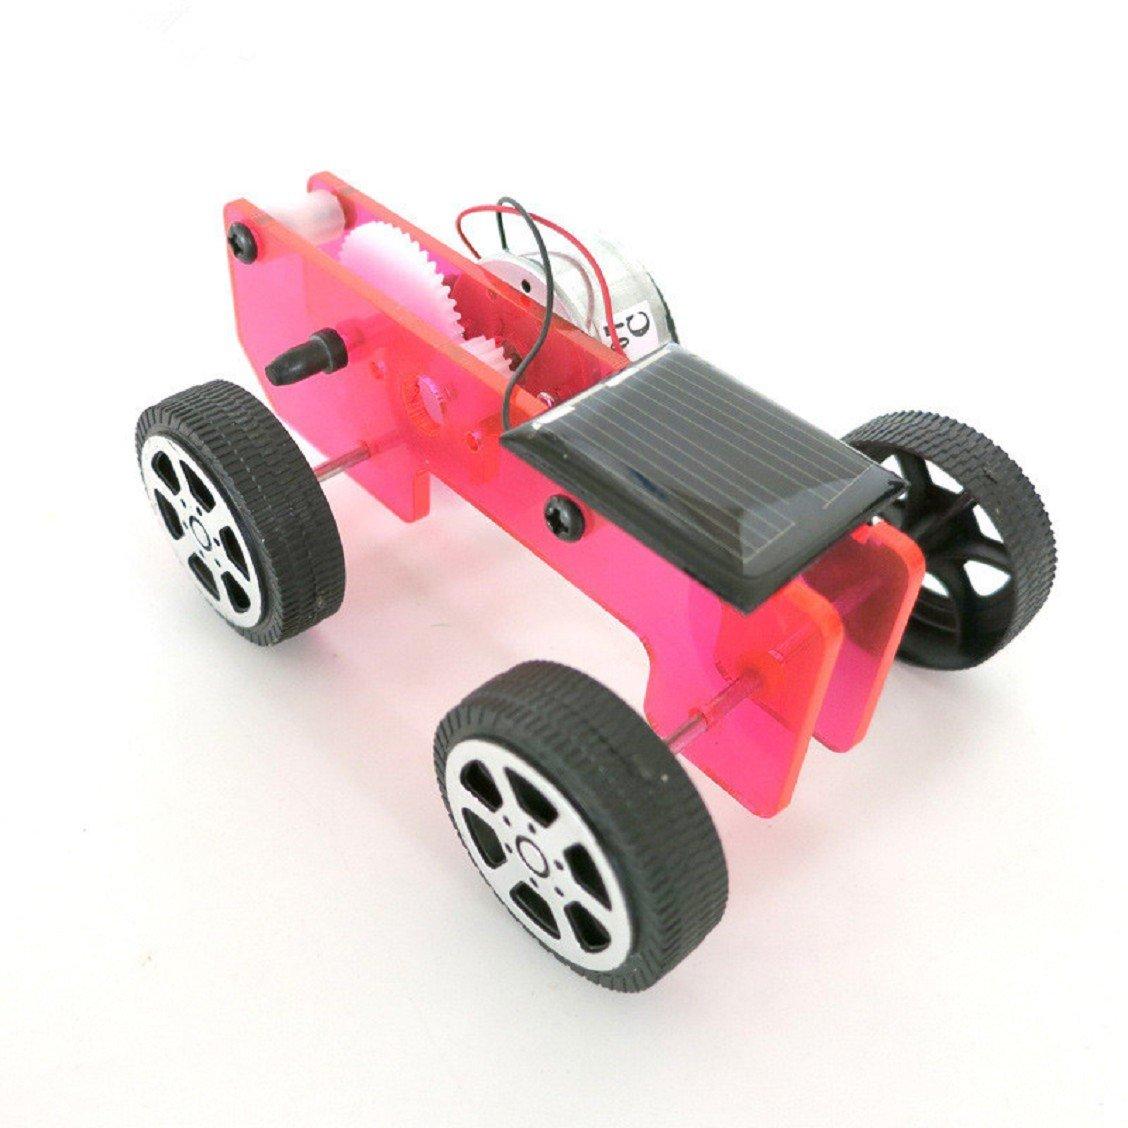 Naladoo 1 Set Mini Solar Powered Toy DIY Car Kit Children Educational Gadget Hobby Funny